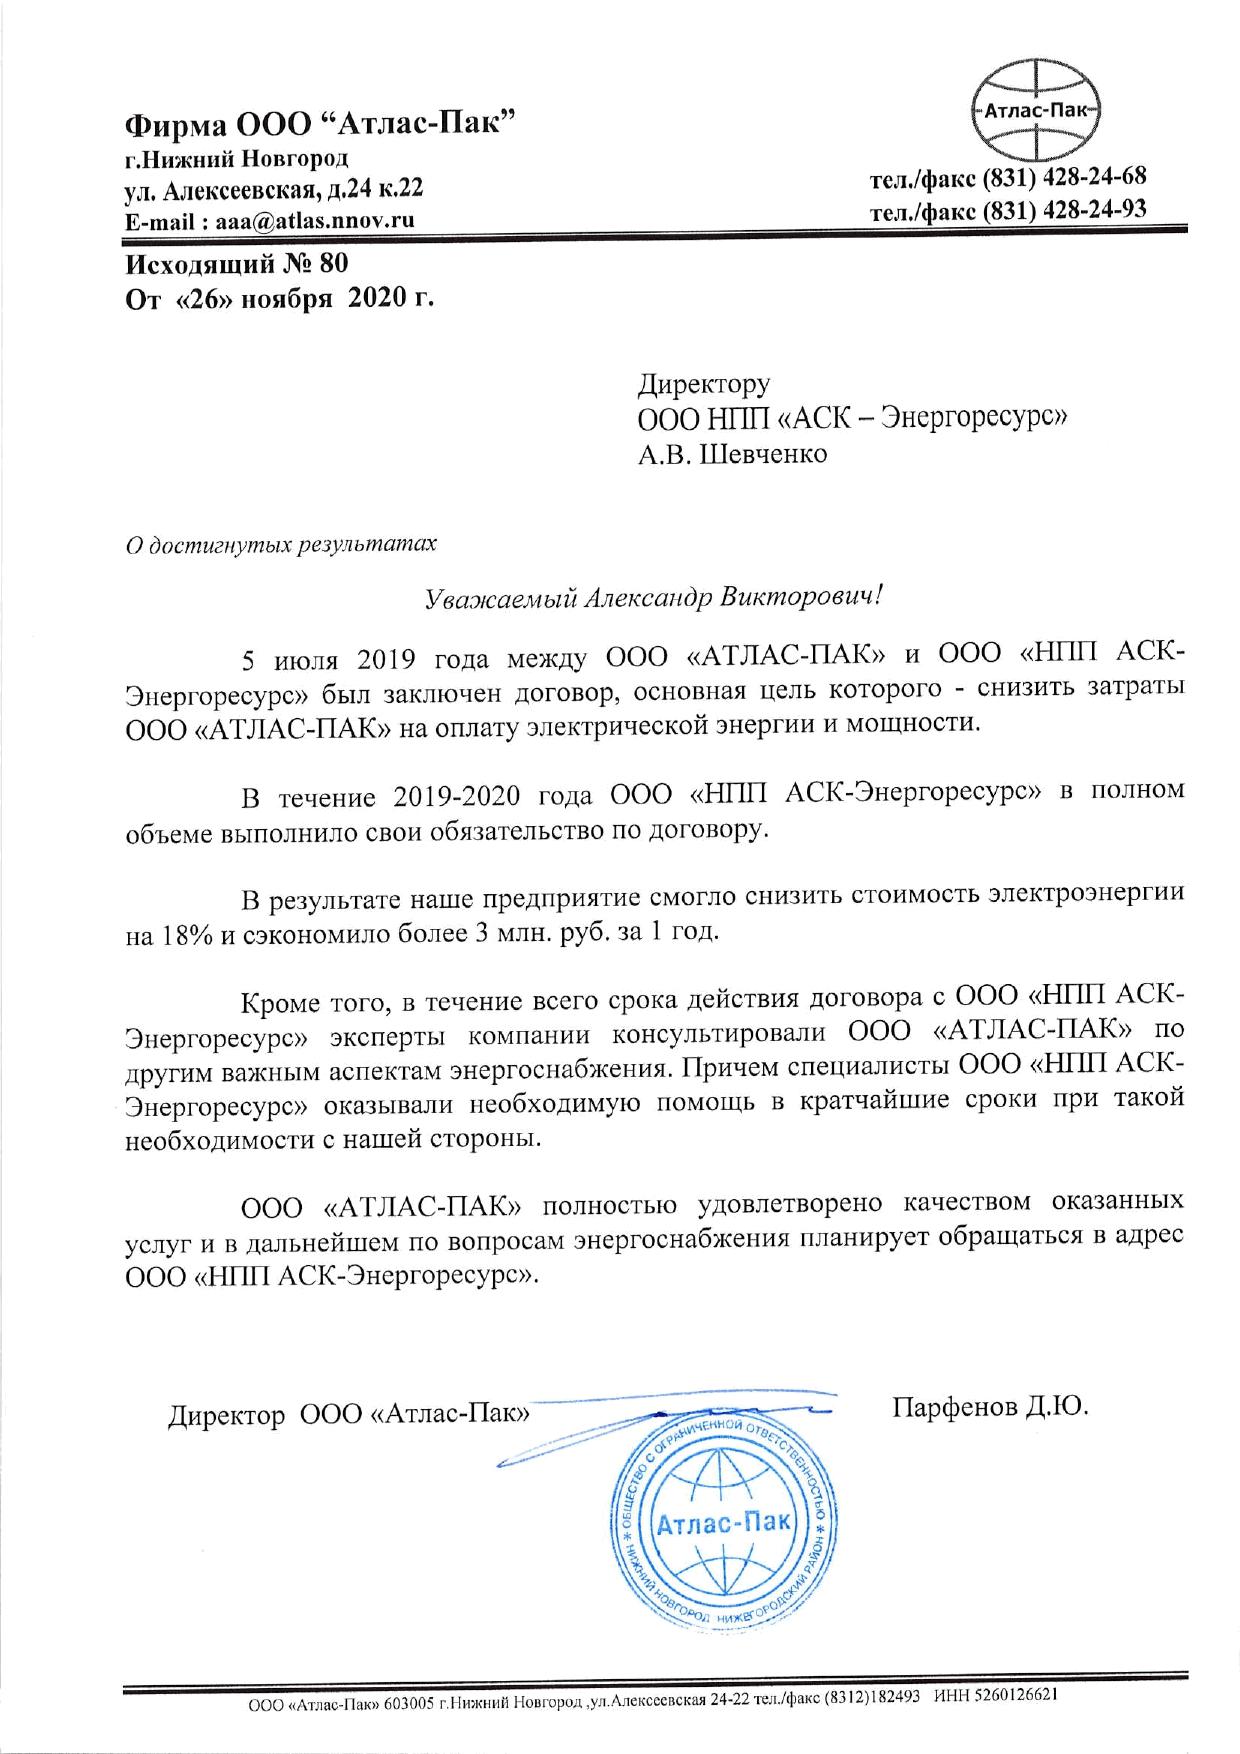 Отзыв Атлас-ПАК